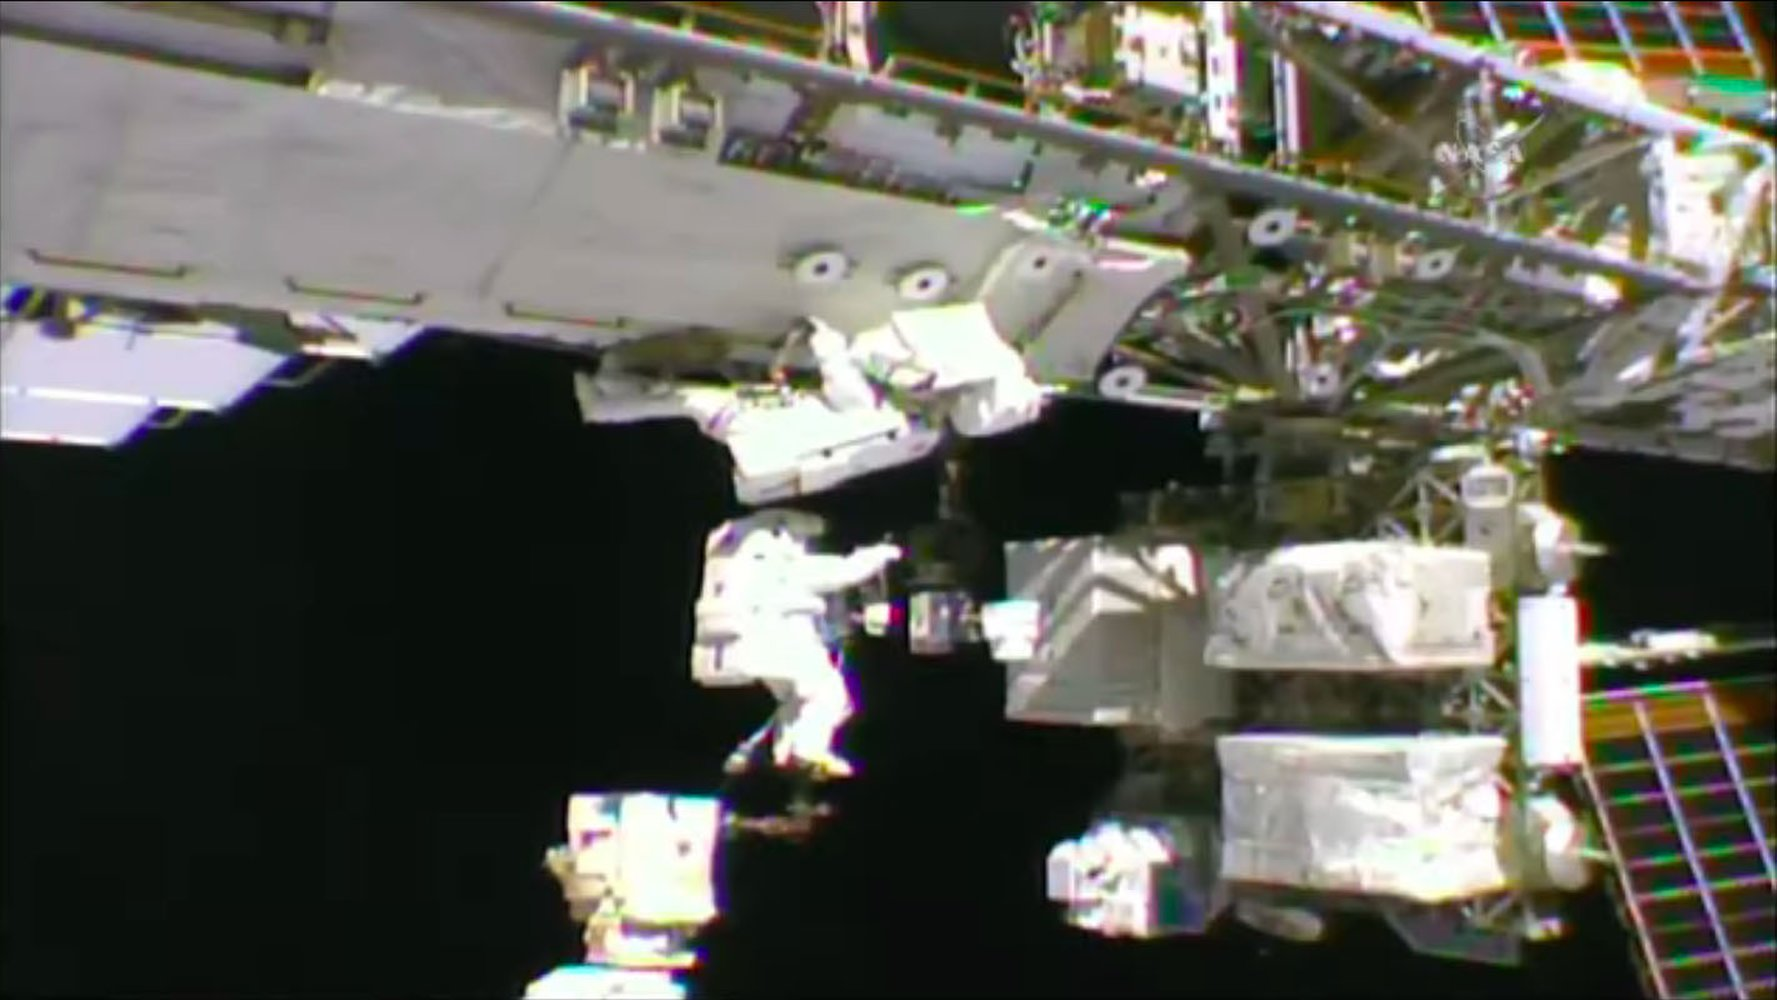 Astronauts Breeze Through Spacewalk at the International Space Station https://t.co/pb6O45orIj https://t.co/58Hip17wxl